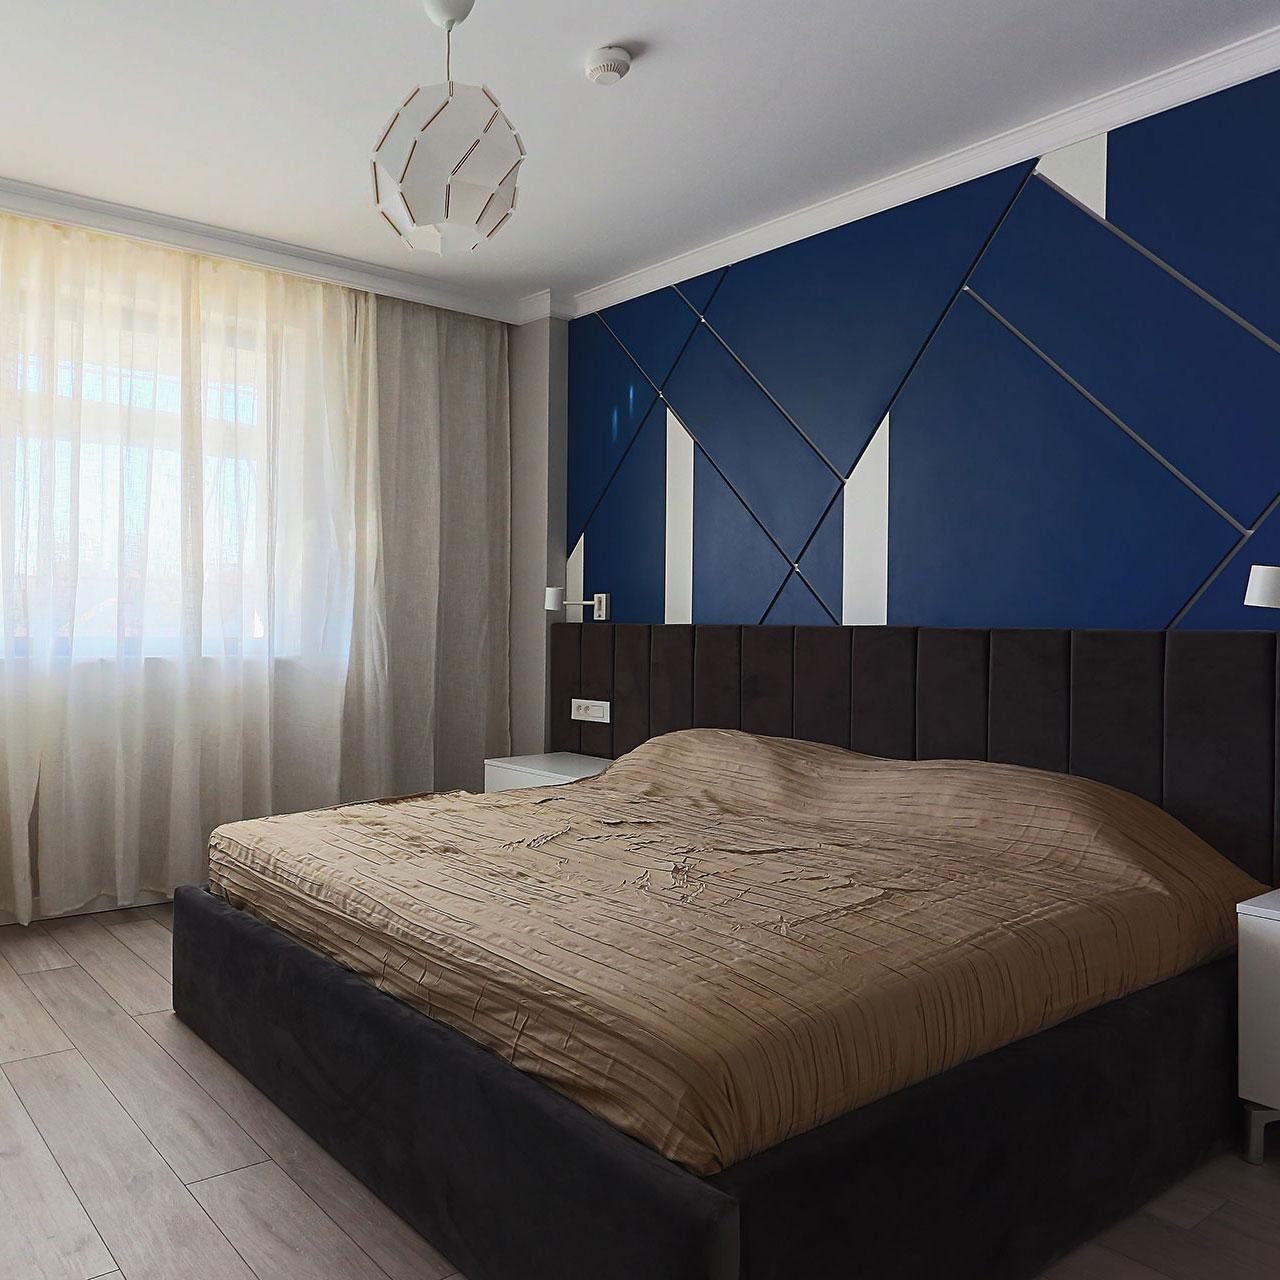 Apartamente cu 2 camere de vanzare Bucuresti - Catedral Residence - Marriott, Piata Unirii, 13 Septembrie, Izvor - G0 - 4